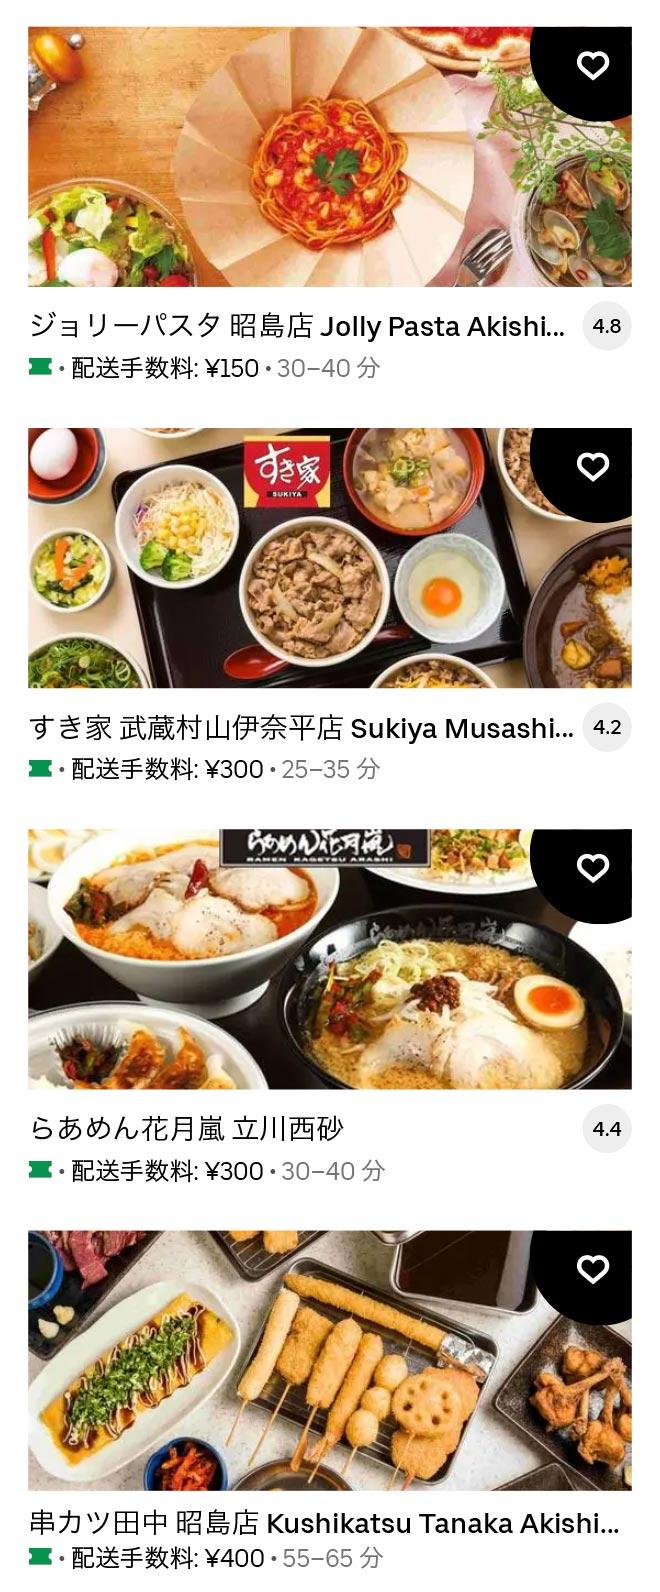 U musashi murayama 2106 04